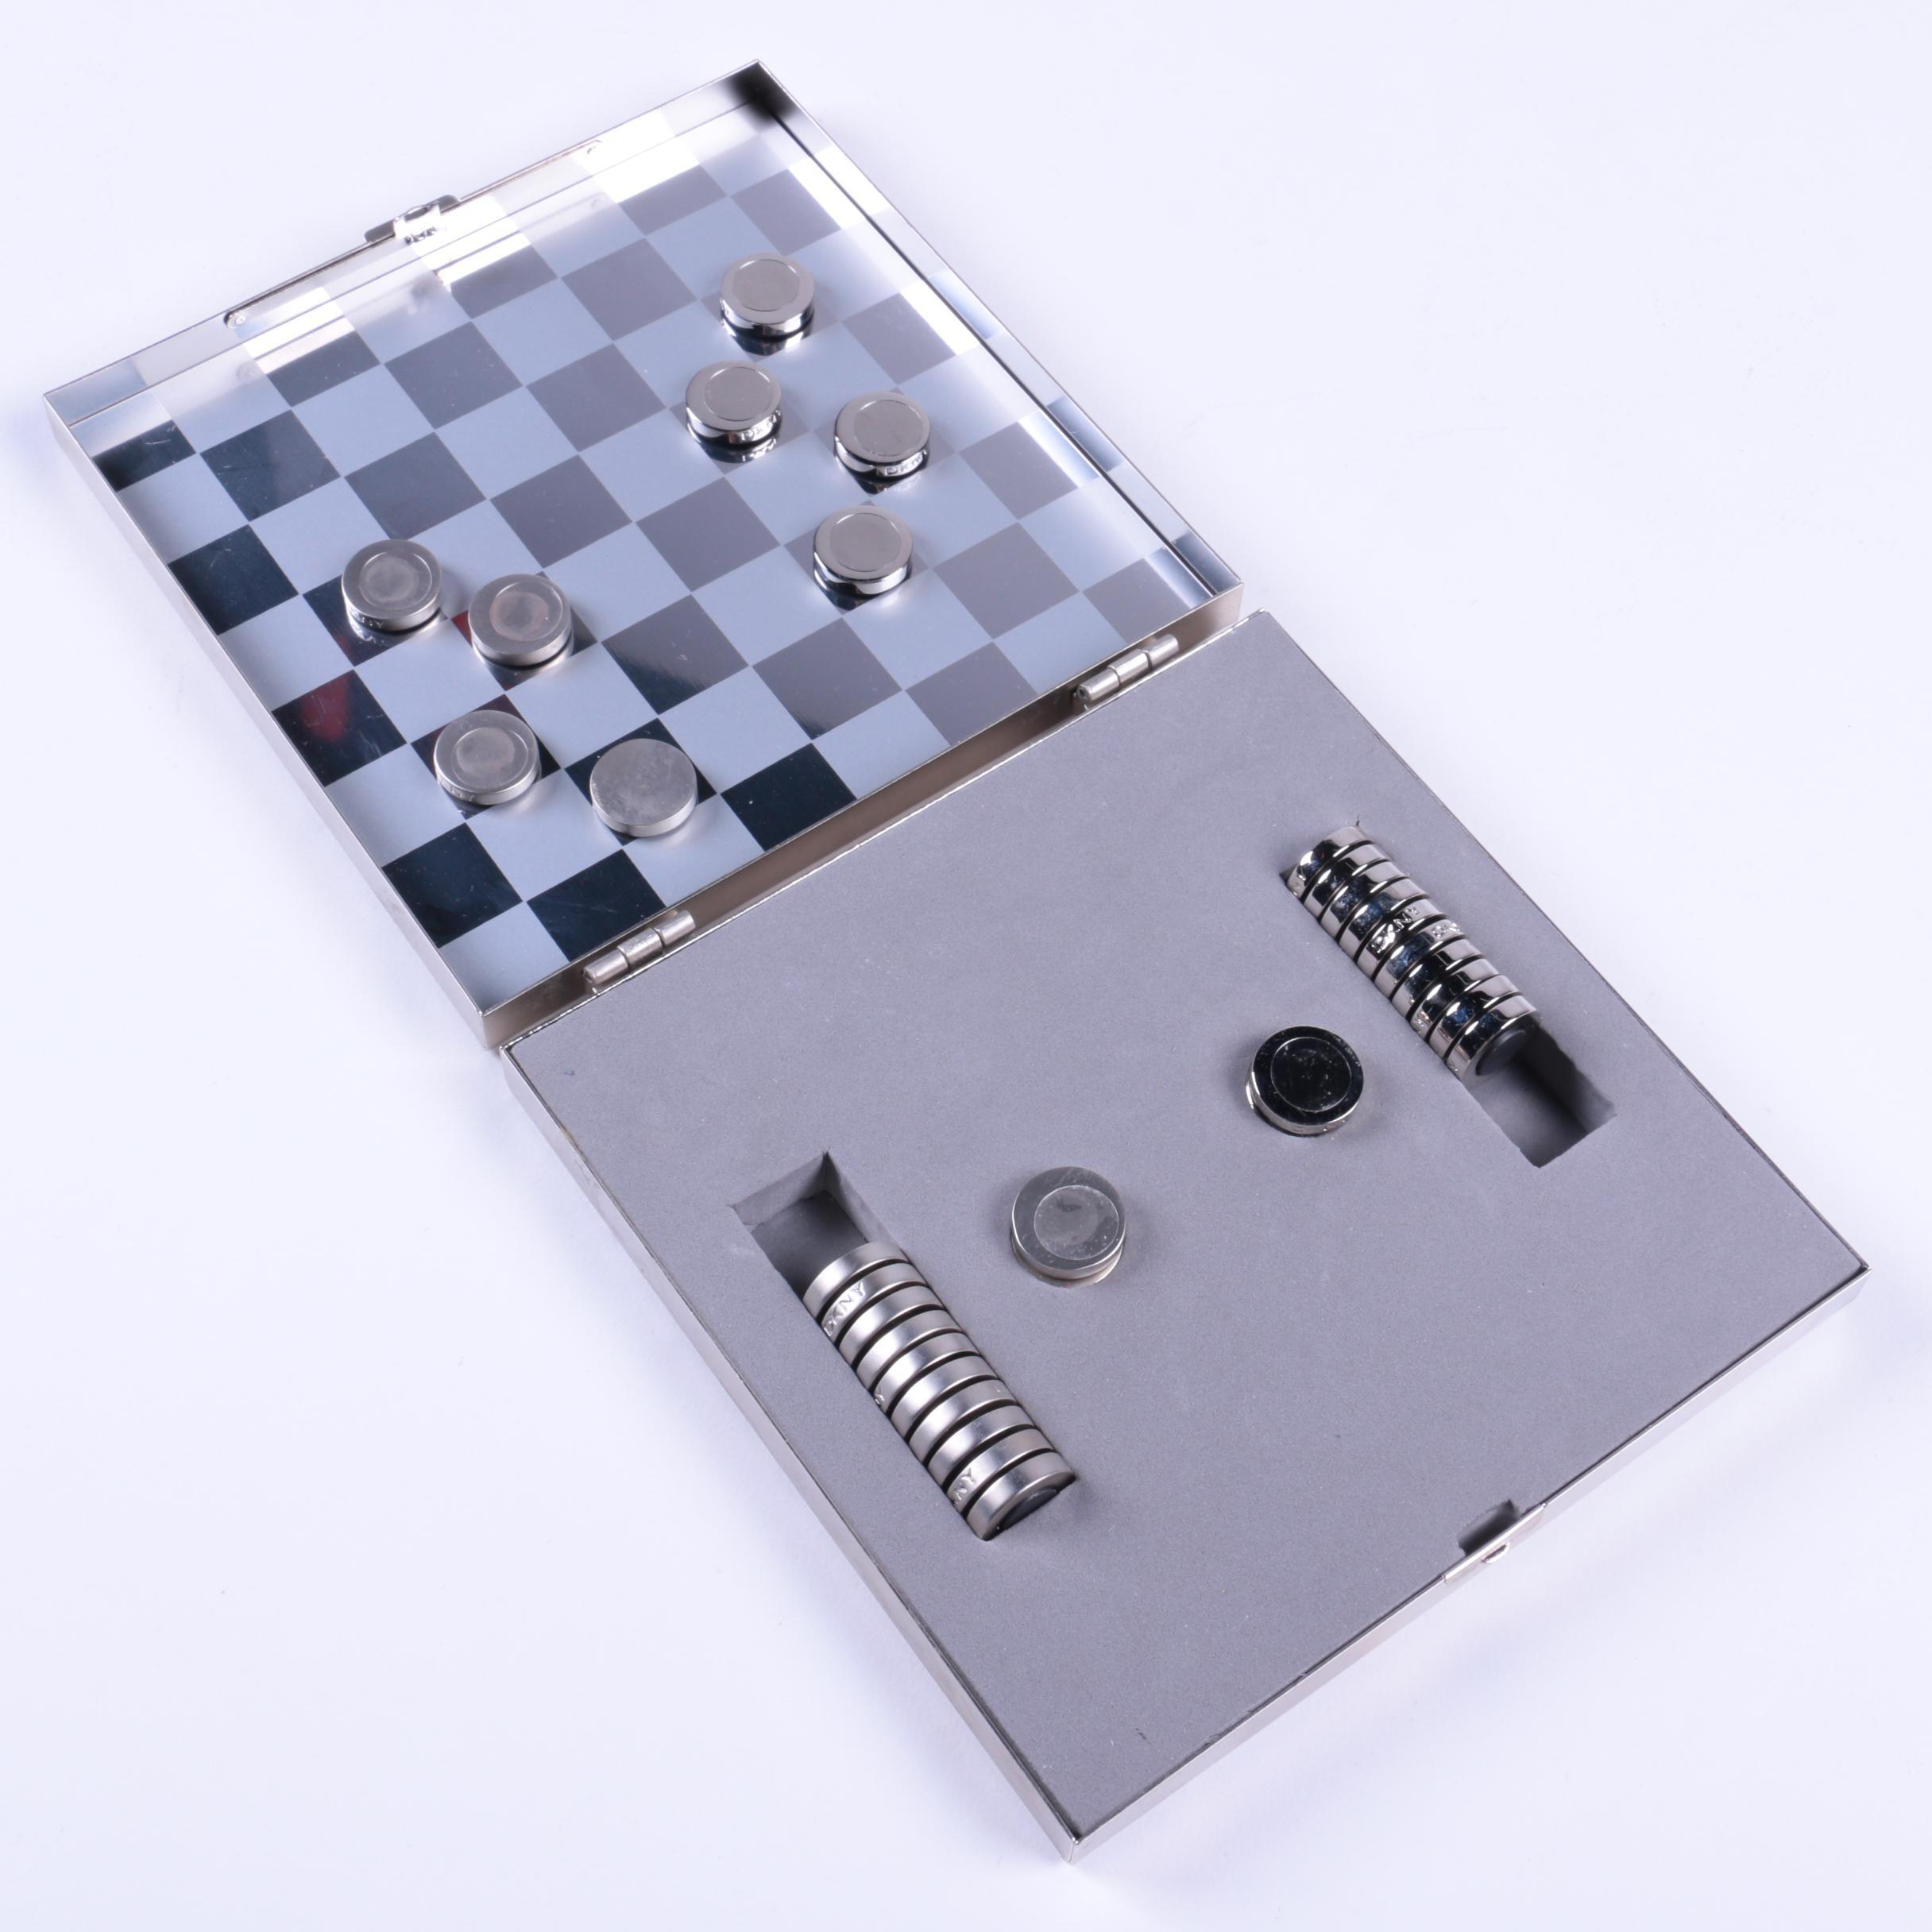 DKNY Travel Checkerboard Set